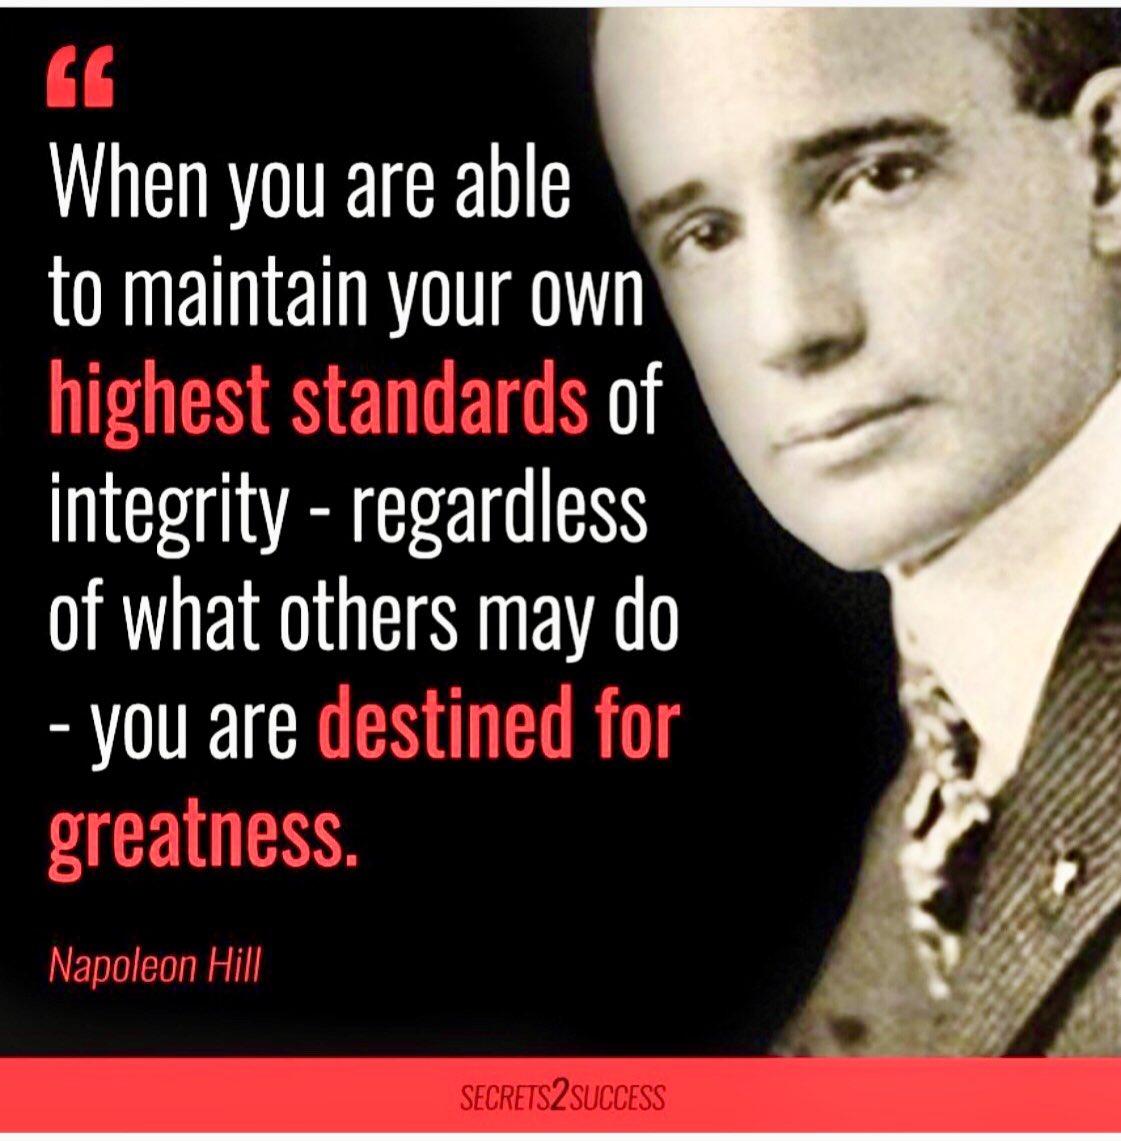 #GoodMorning #Twitterverse  #GoodWeek #enterprise #business #standards #greatness #NapoleonHill pic.twitter.com/nV54DBRTSL